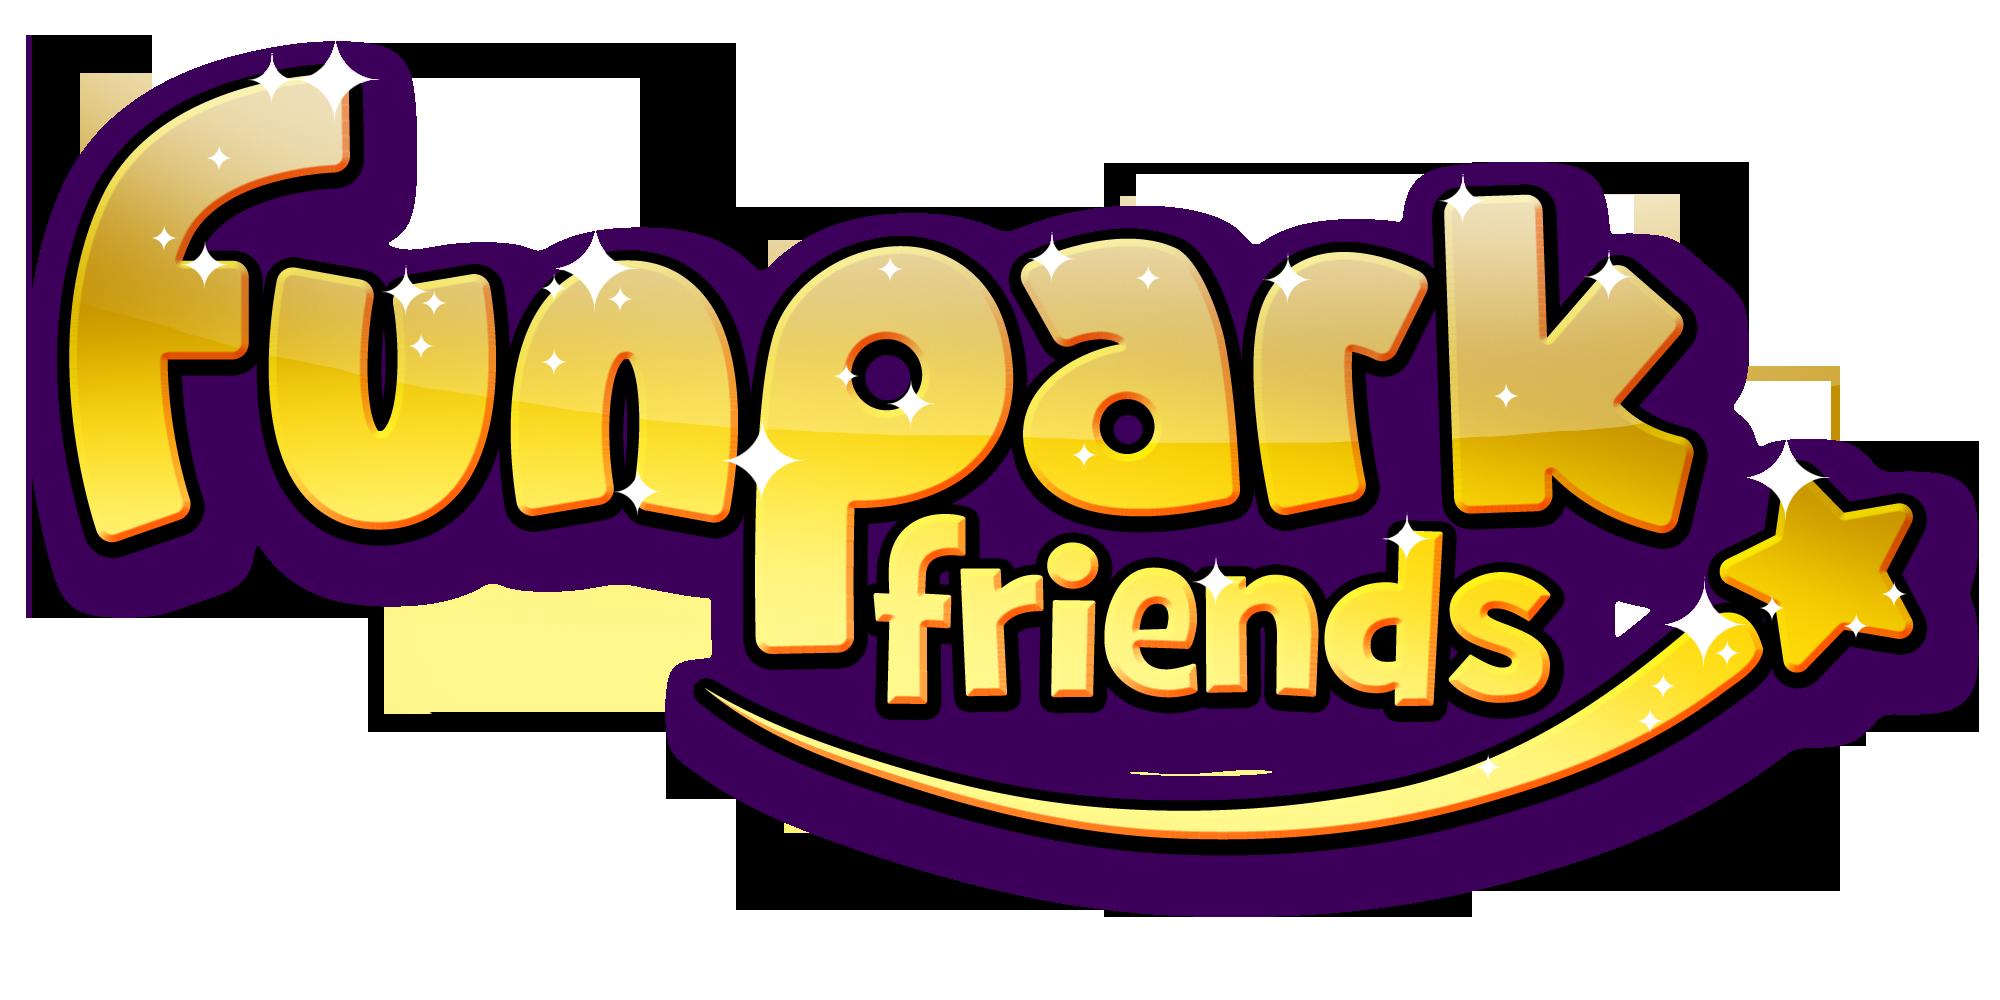 FunparkFriendsLogo.png